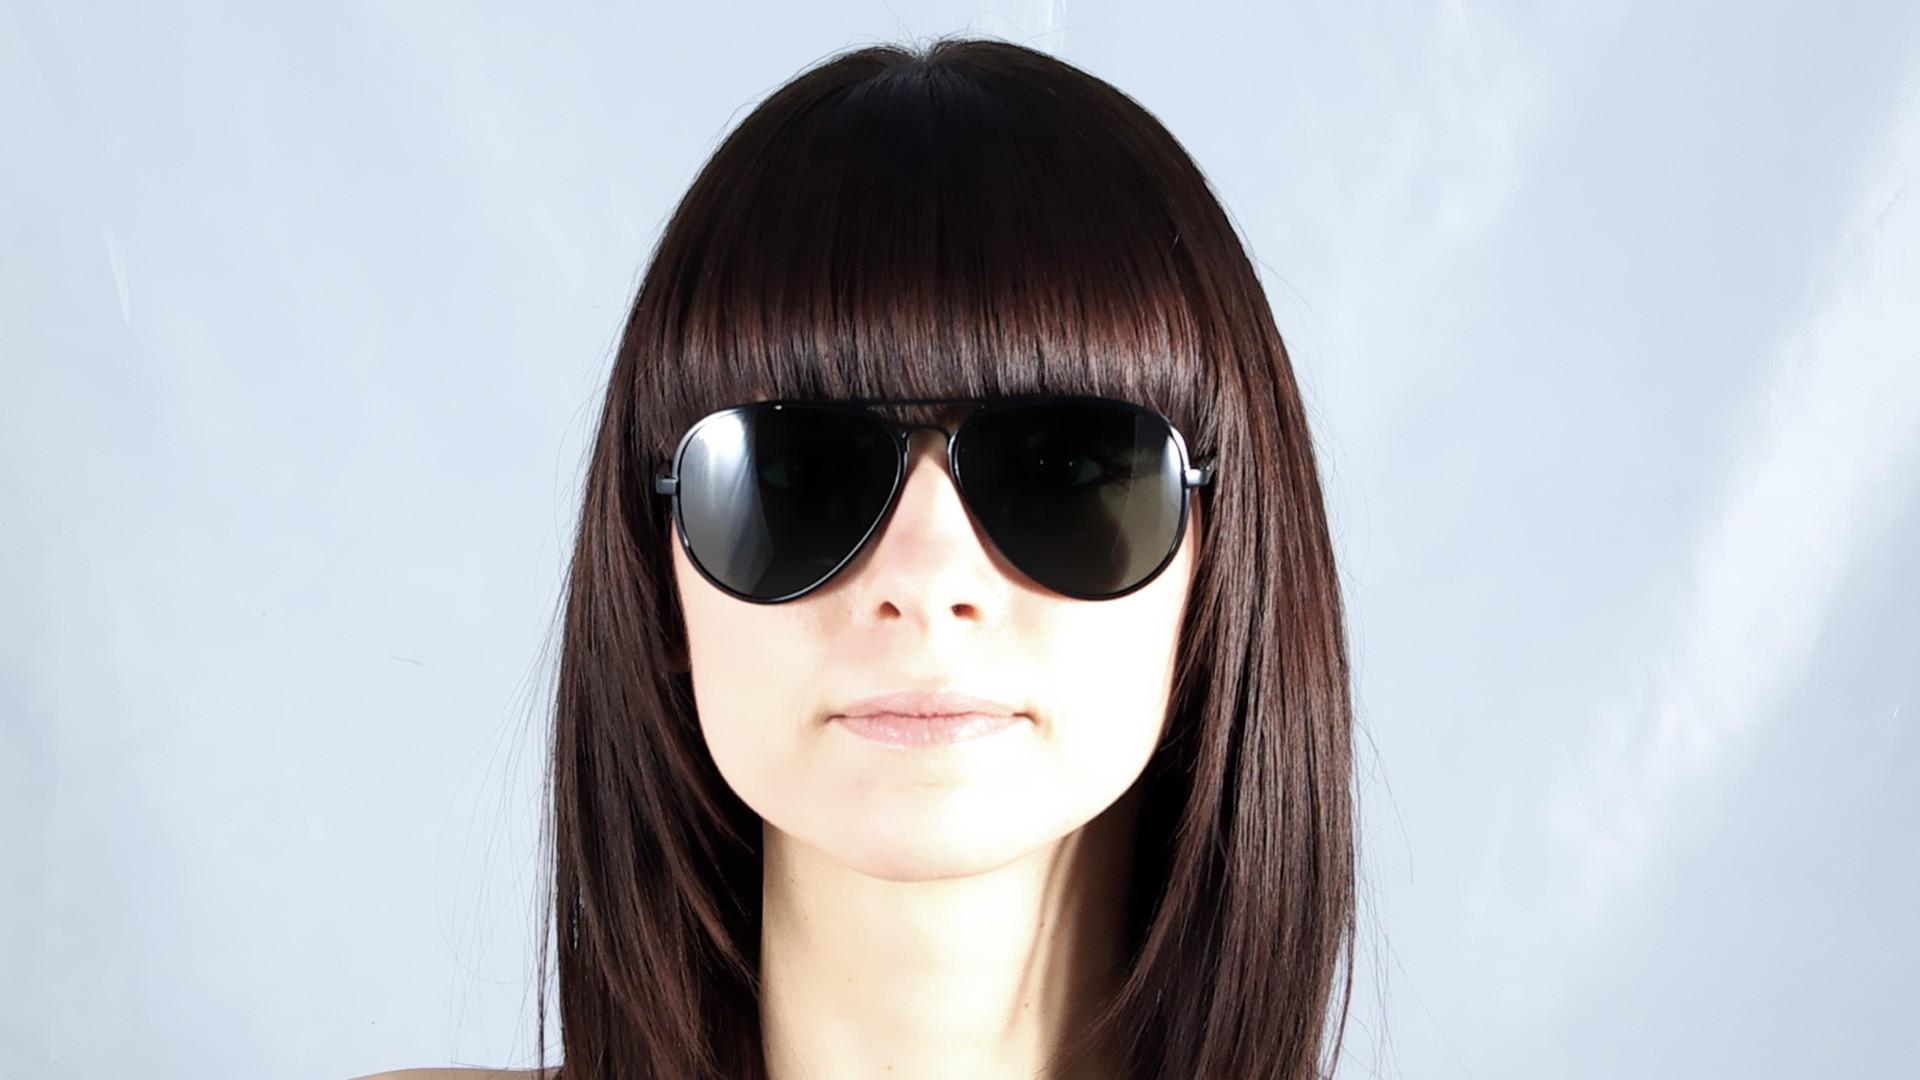 f6262baba2 Ray Ban Rb4180 59 Aviator Liteforce Sunglasses Black « Heritage Malta